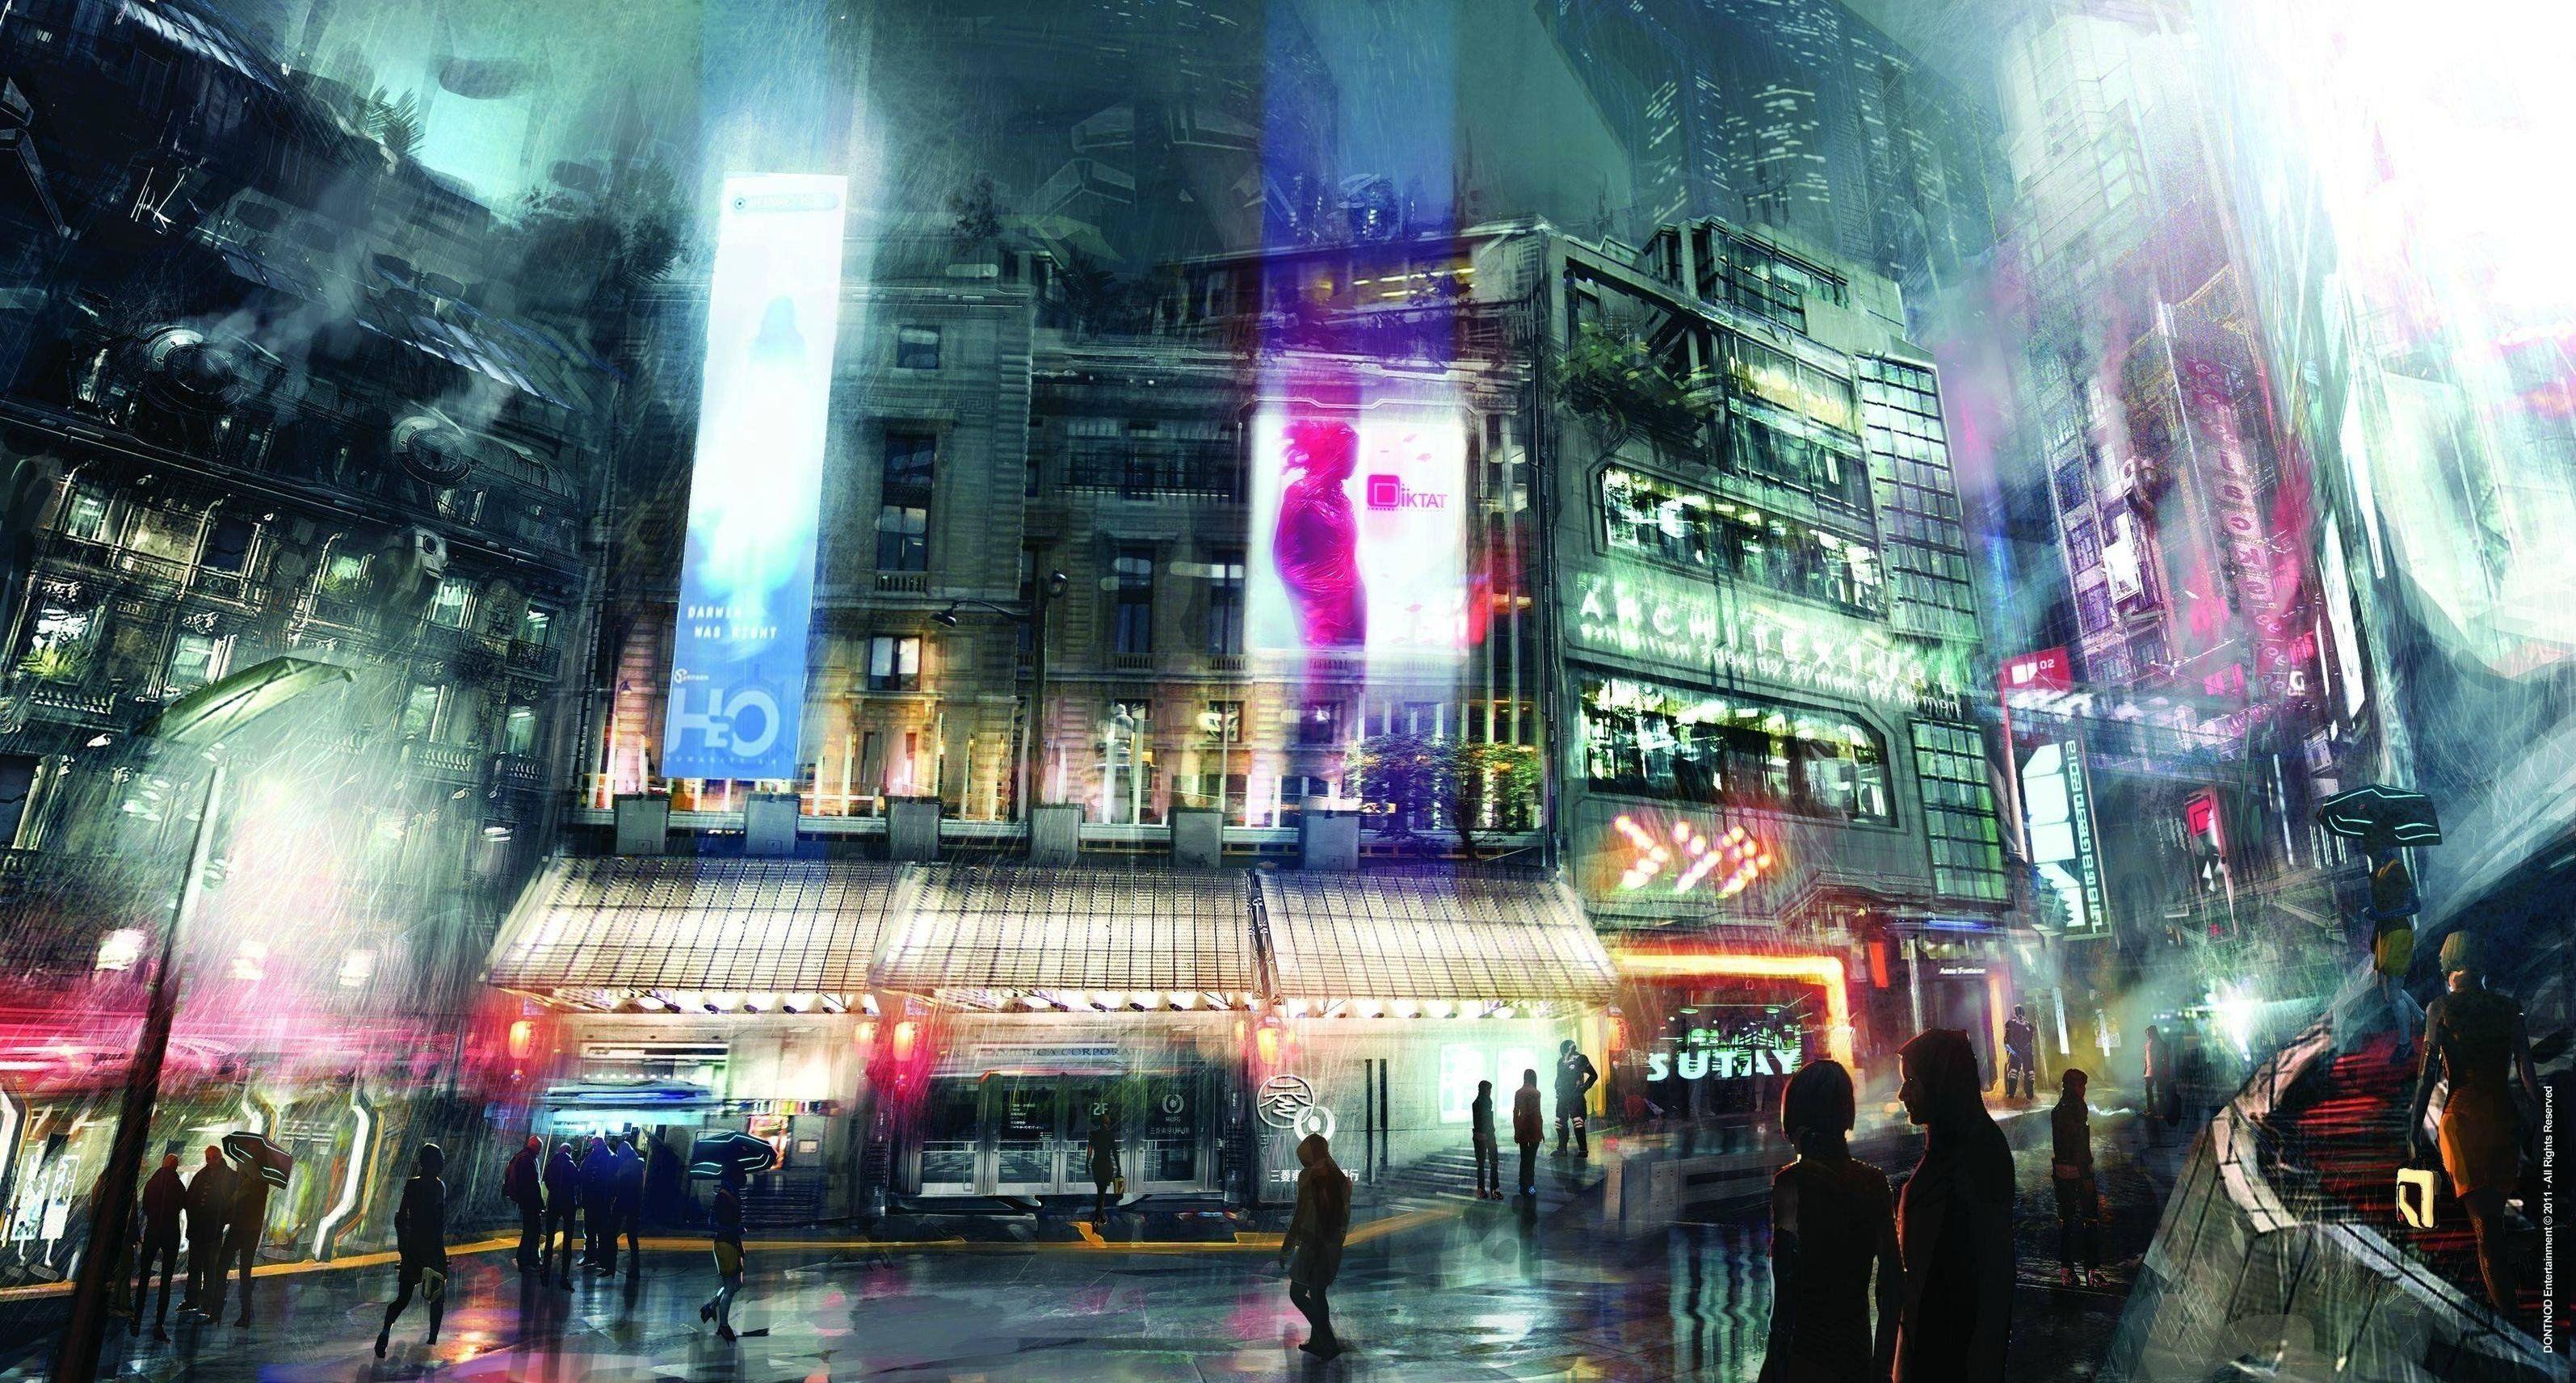 Cyberpunk Wallpaper Futuristic City Cyberpunk City Anime City